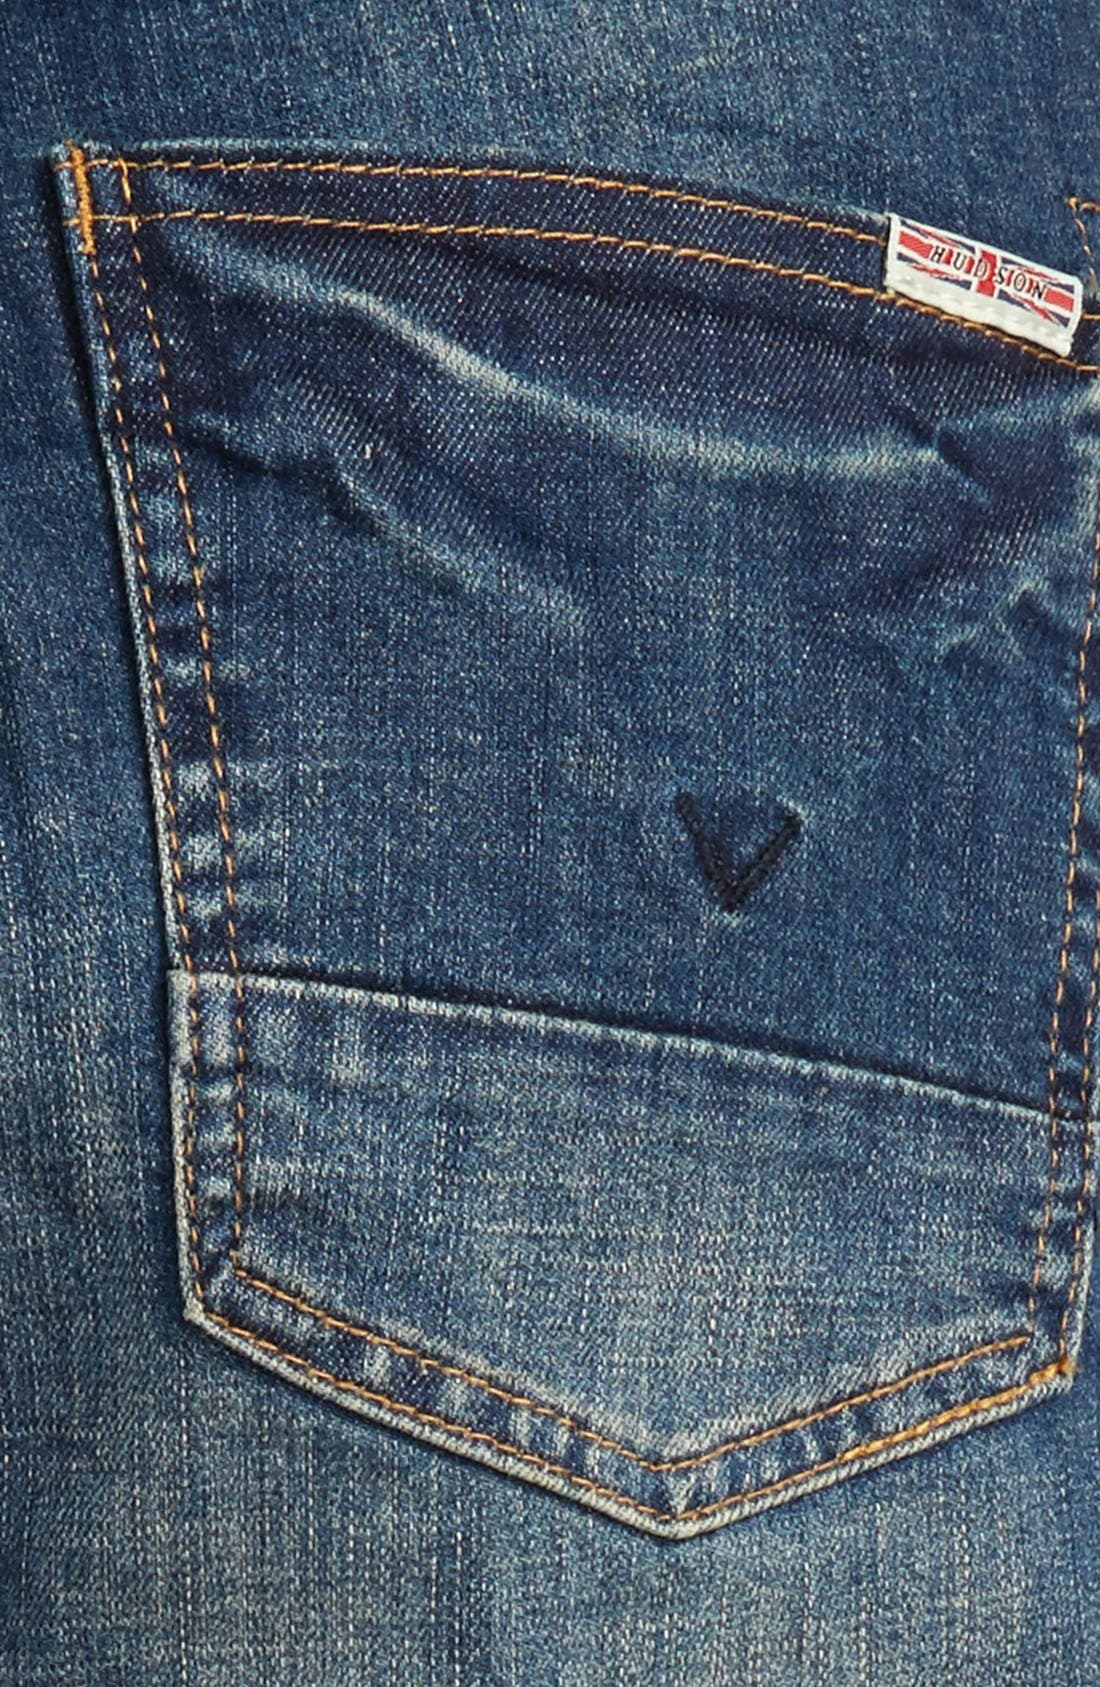 Jagger Slim Fit Straight Leg Jeans,                             Alternate thumbnail 13, color,